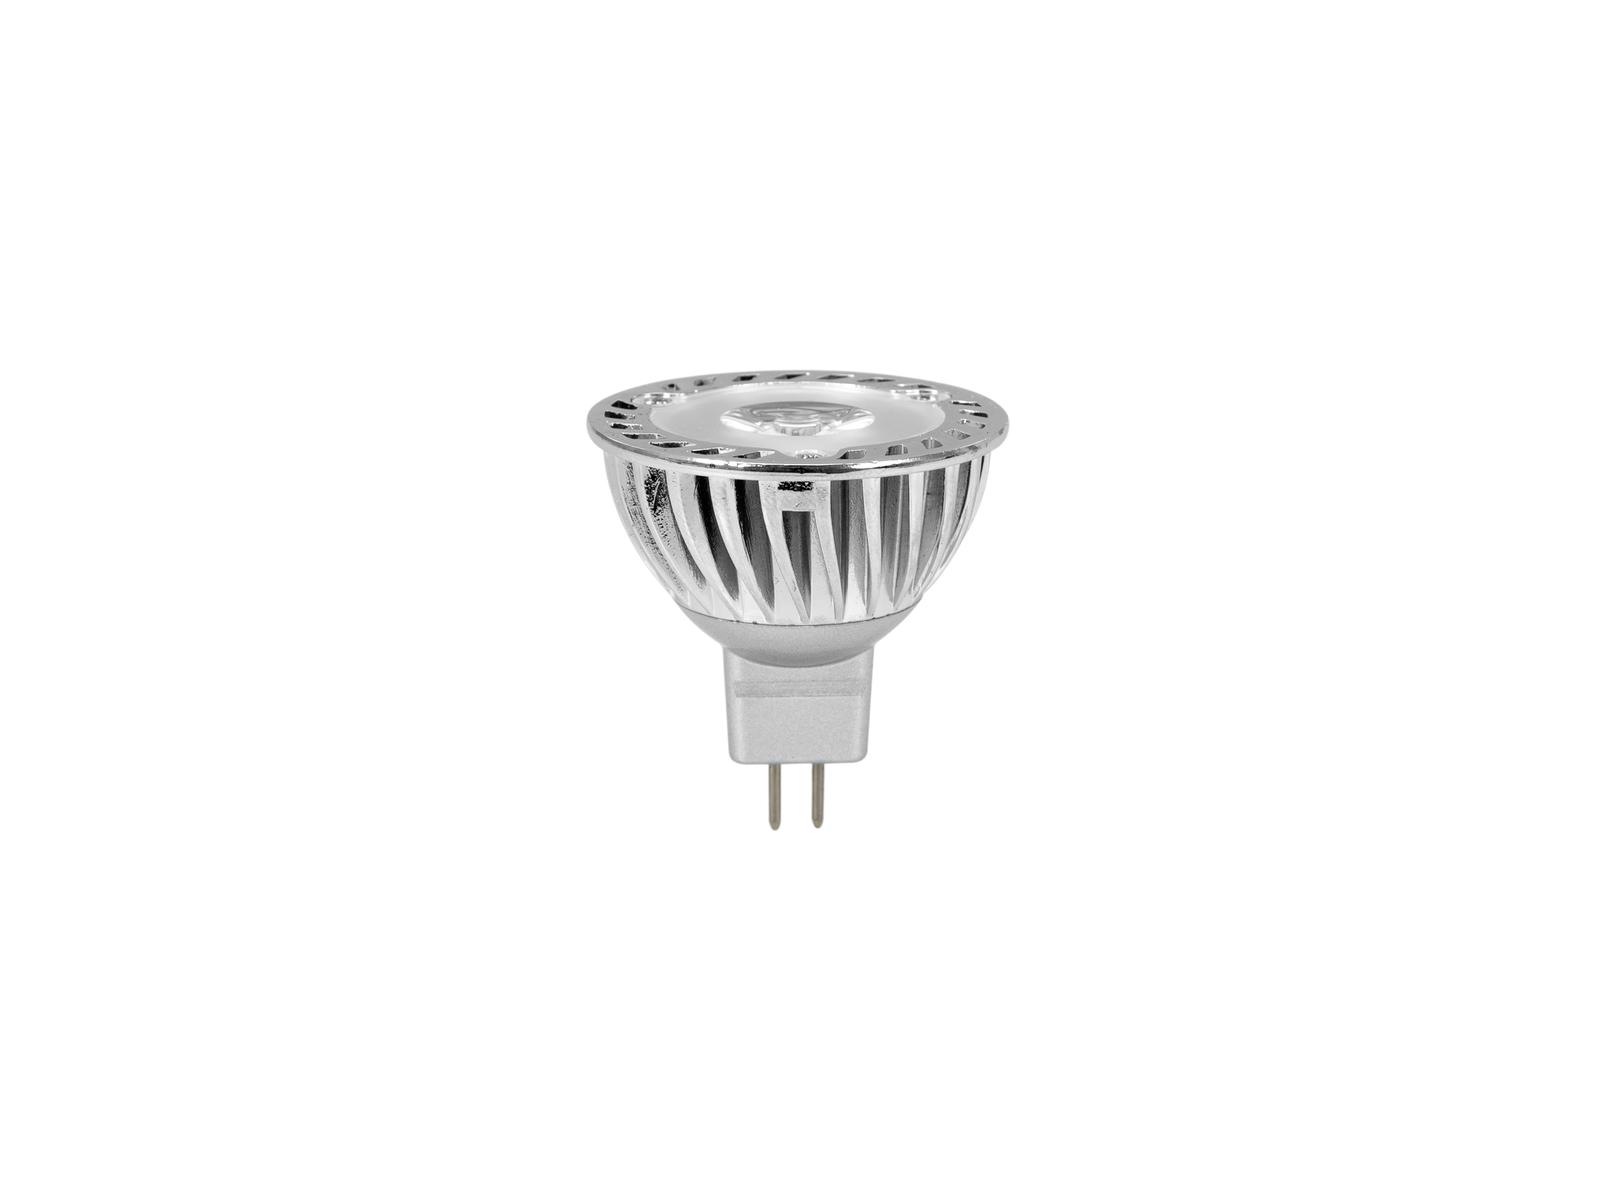 Lamp Bulb OMNILUX MR-16 12V GU-5.3 3W LED 3000K